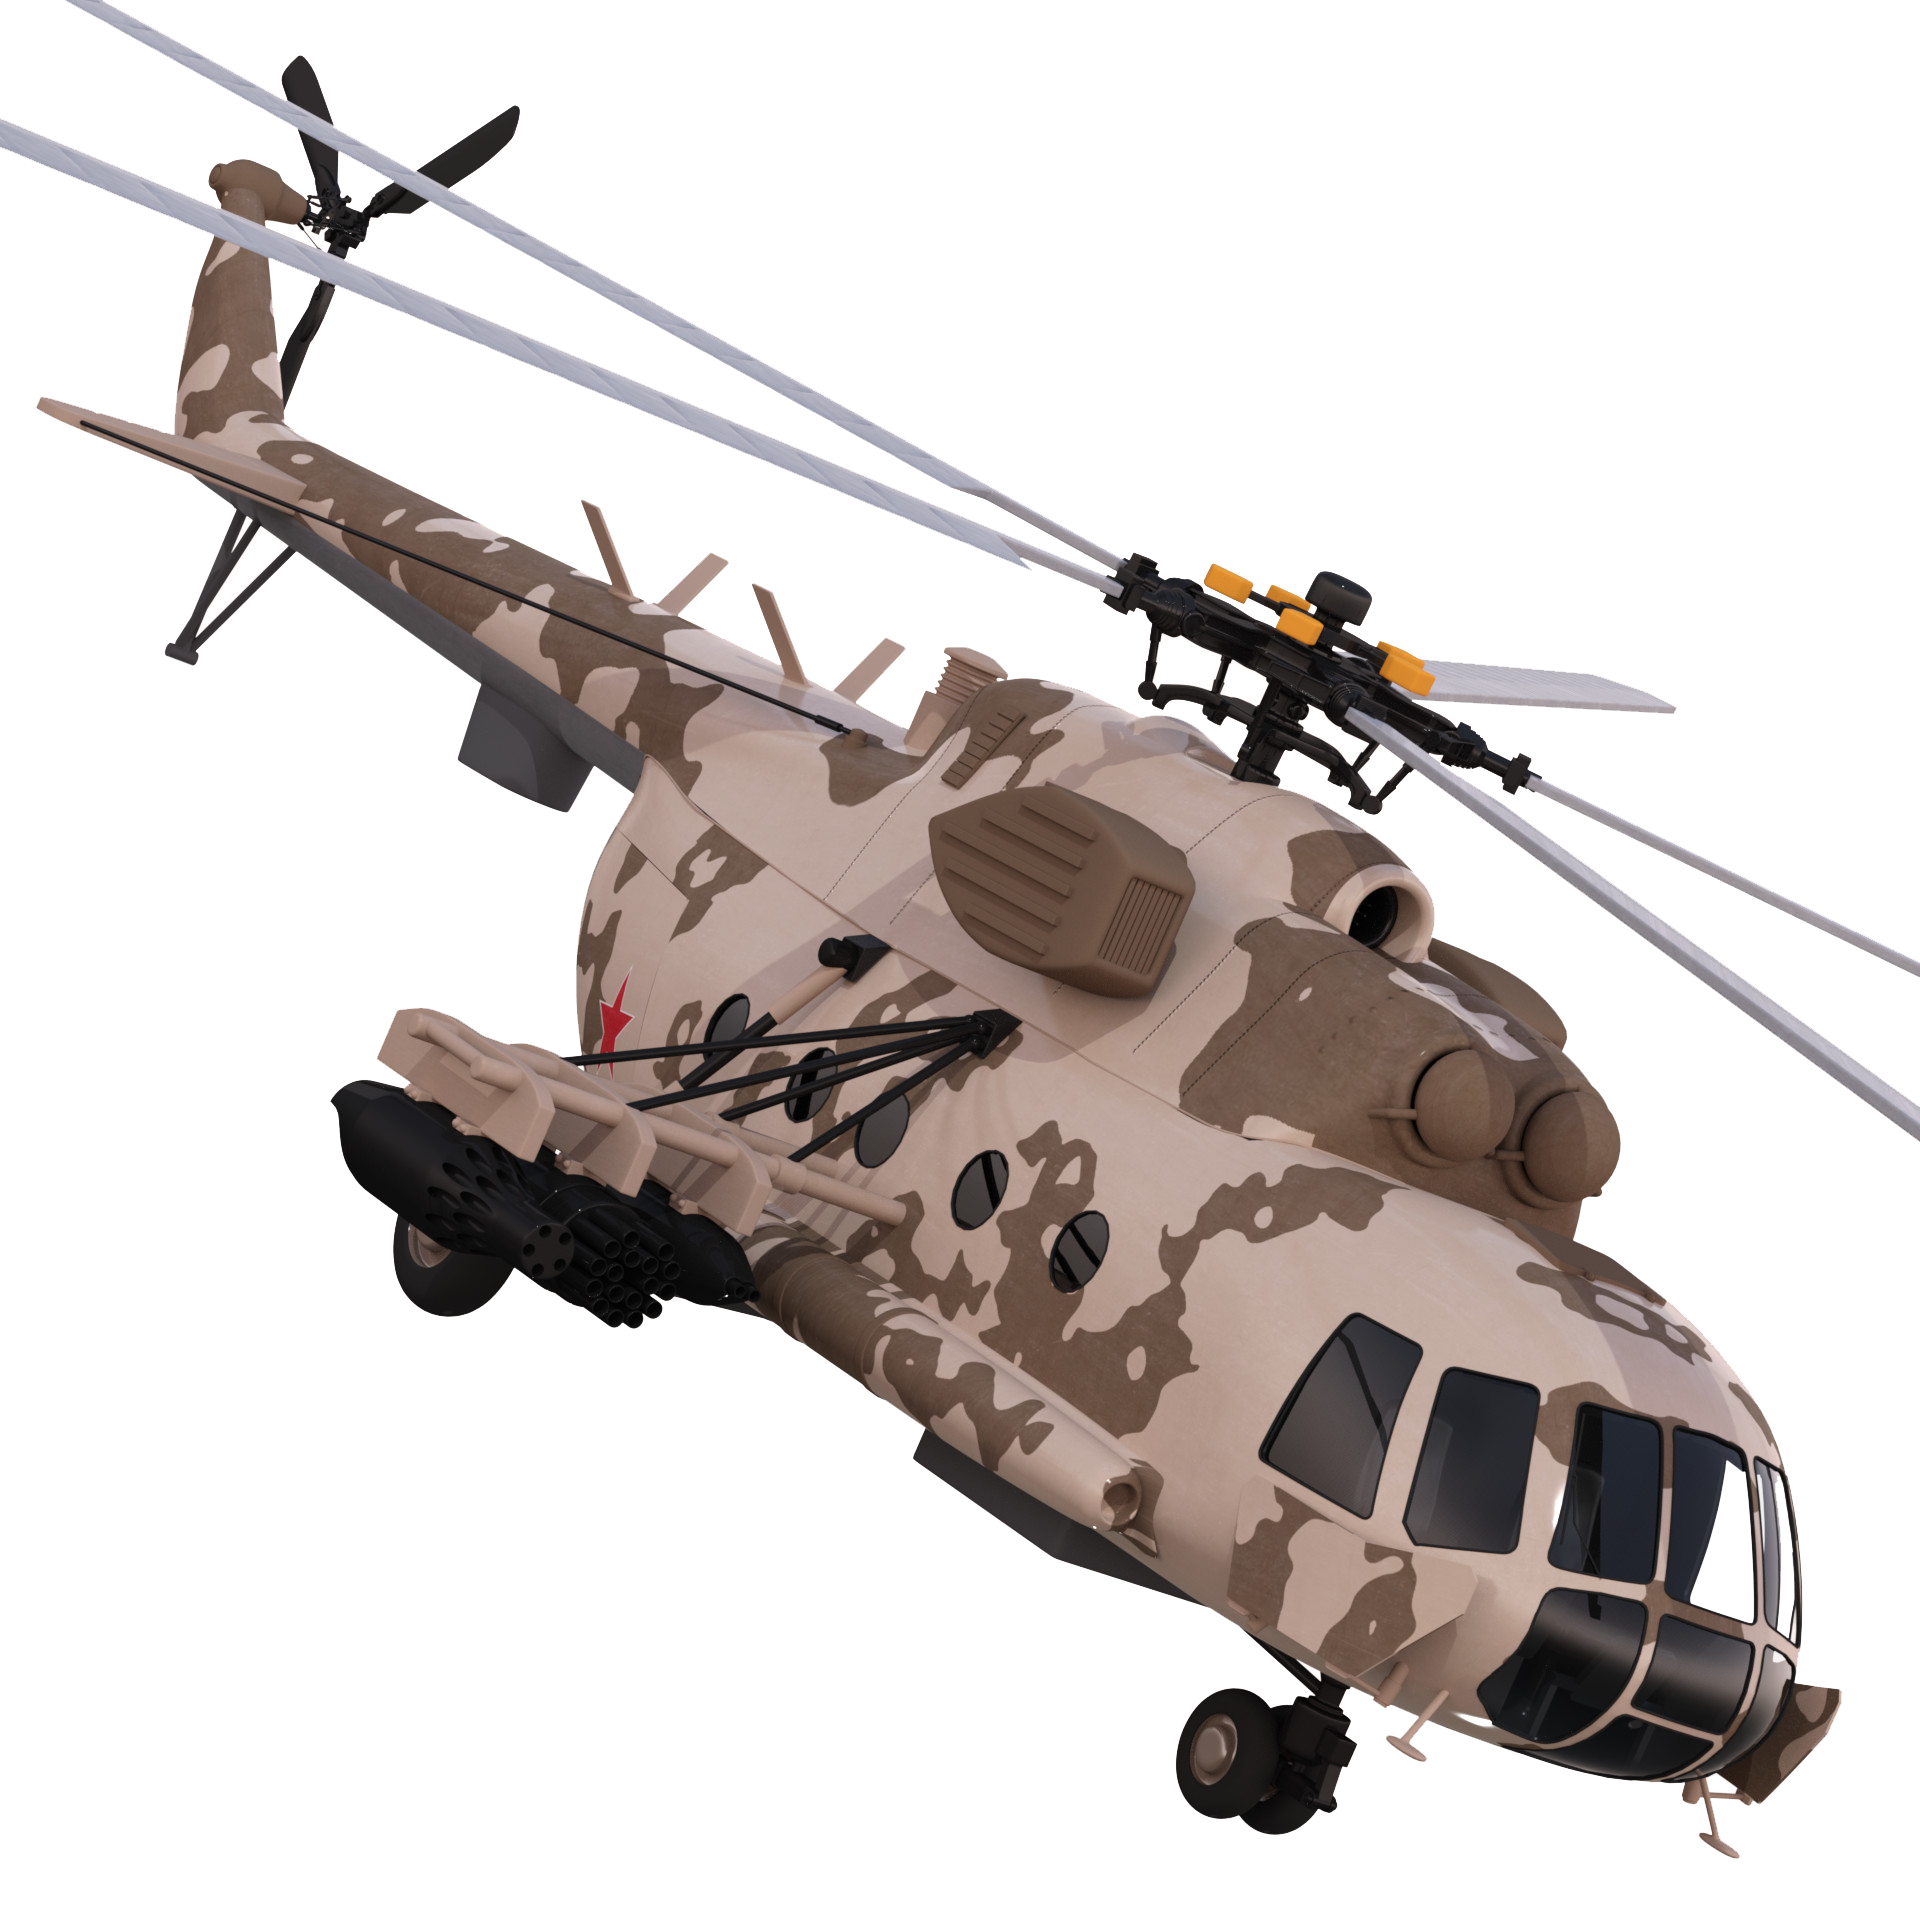 Army Helicopter Png Helicopter Png . - Army Helicopter, Transparent background PNG HD thumbnail